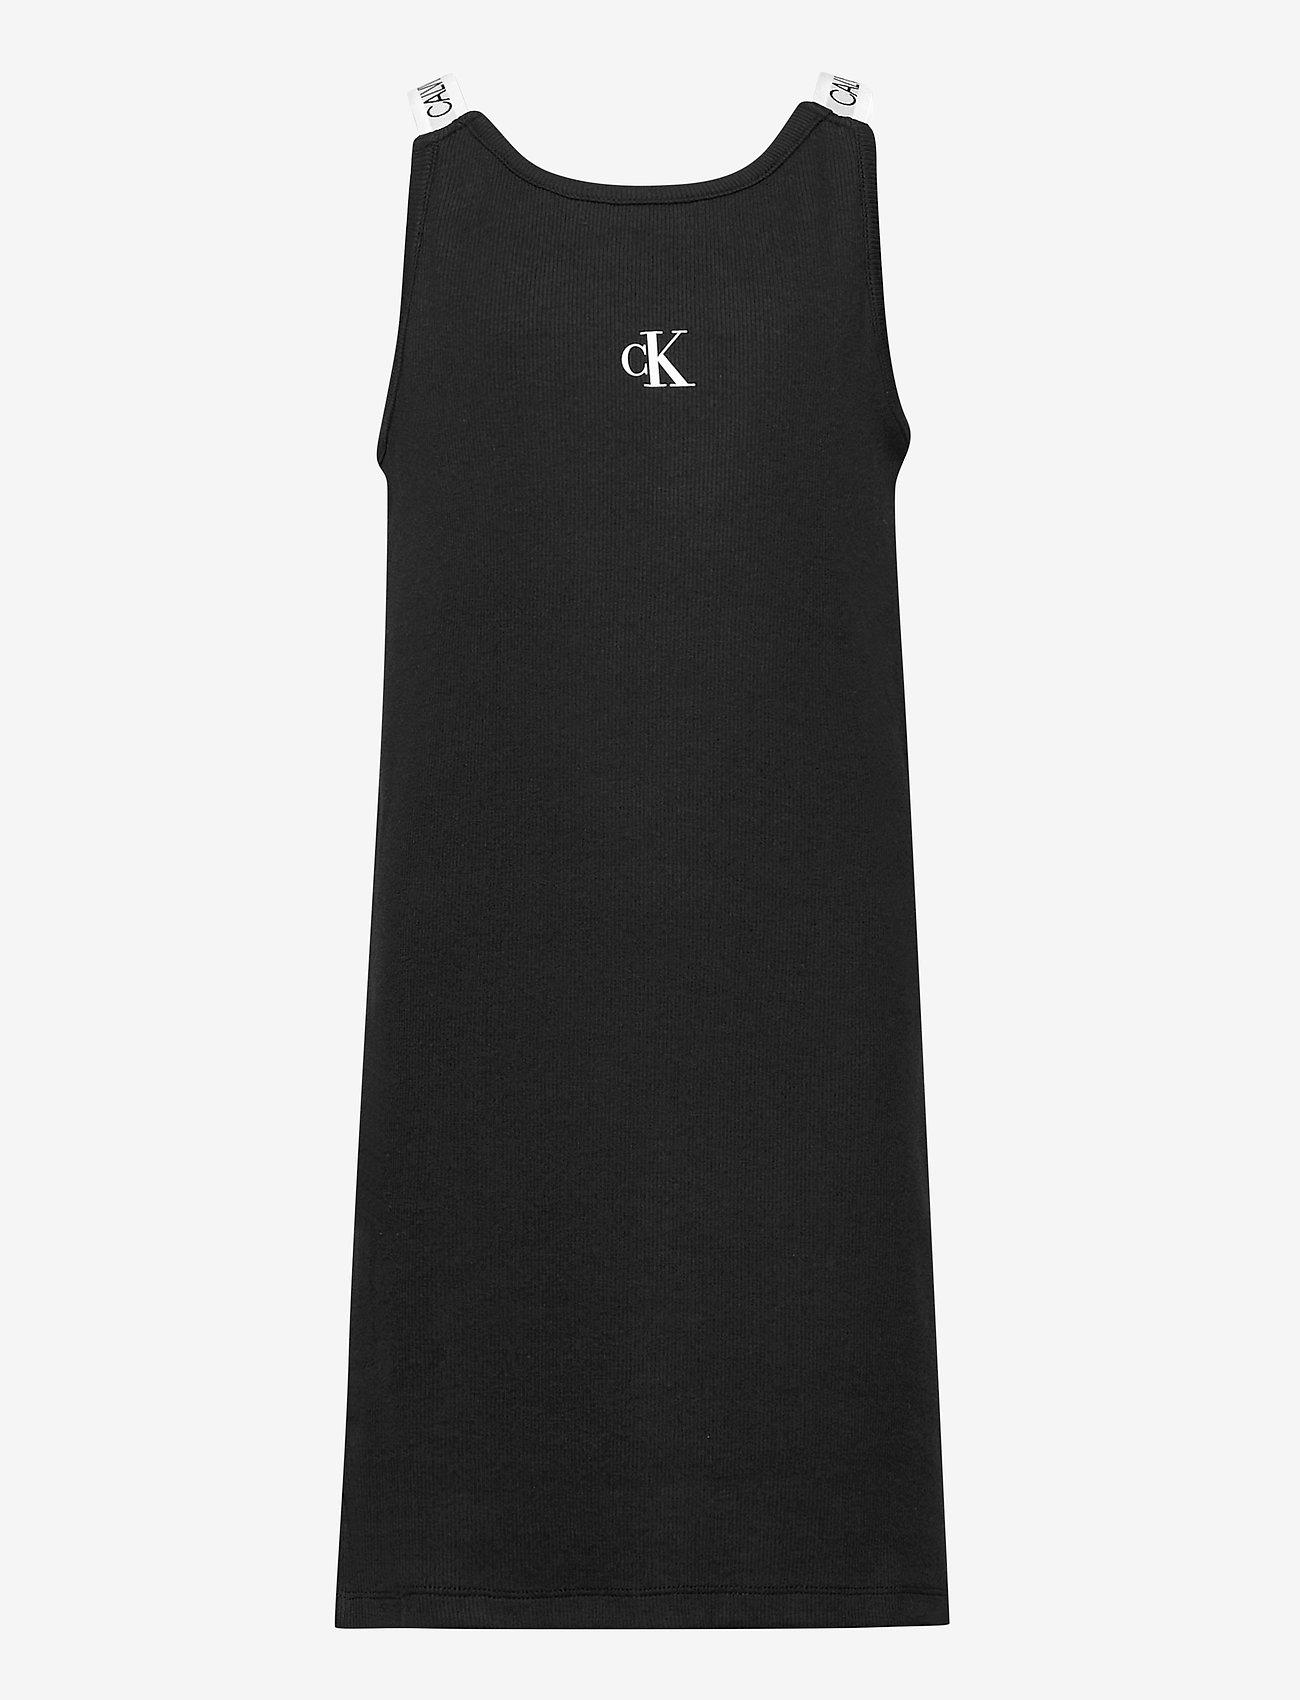 Calvin Klein - LOGO TAPE RIB STRAP DRESS - kleider - ck black - 0